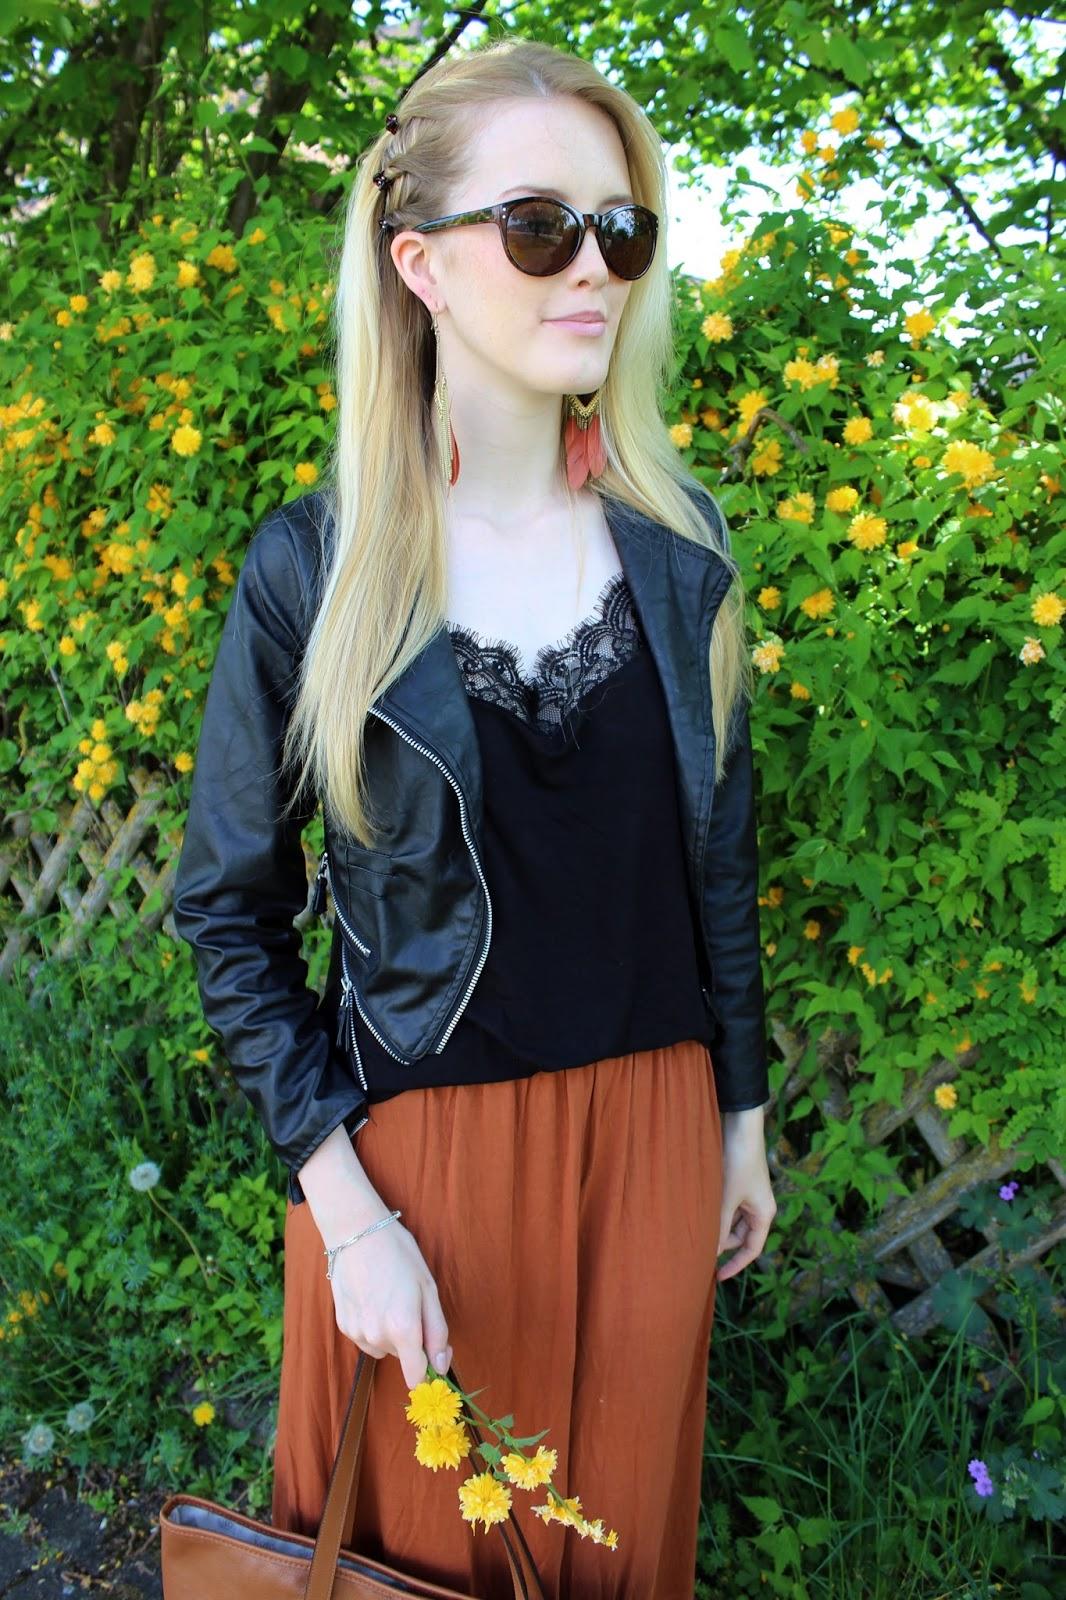 Maxirock maxiskirt Outfit TheBlondeLion Michael Kors Maxi Boho Hippie edgy